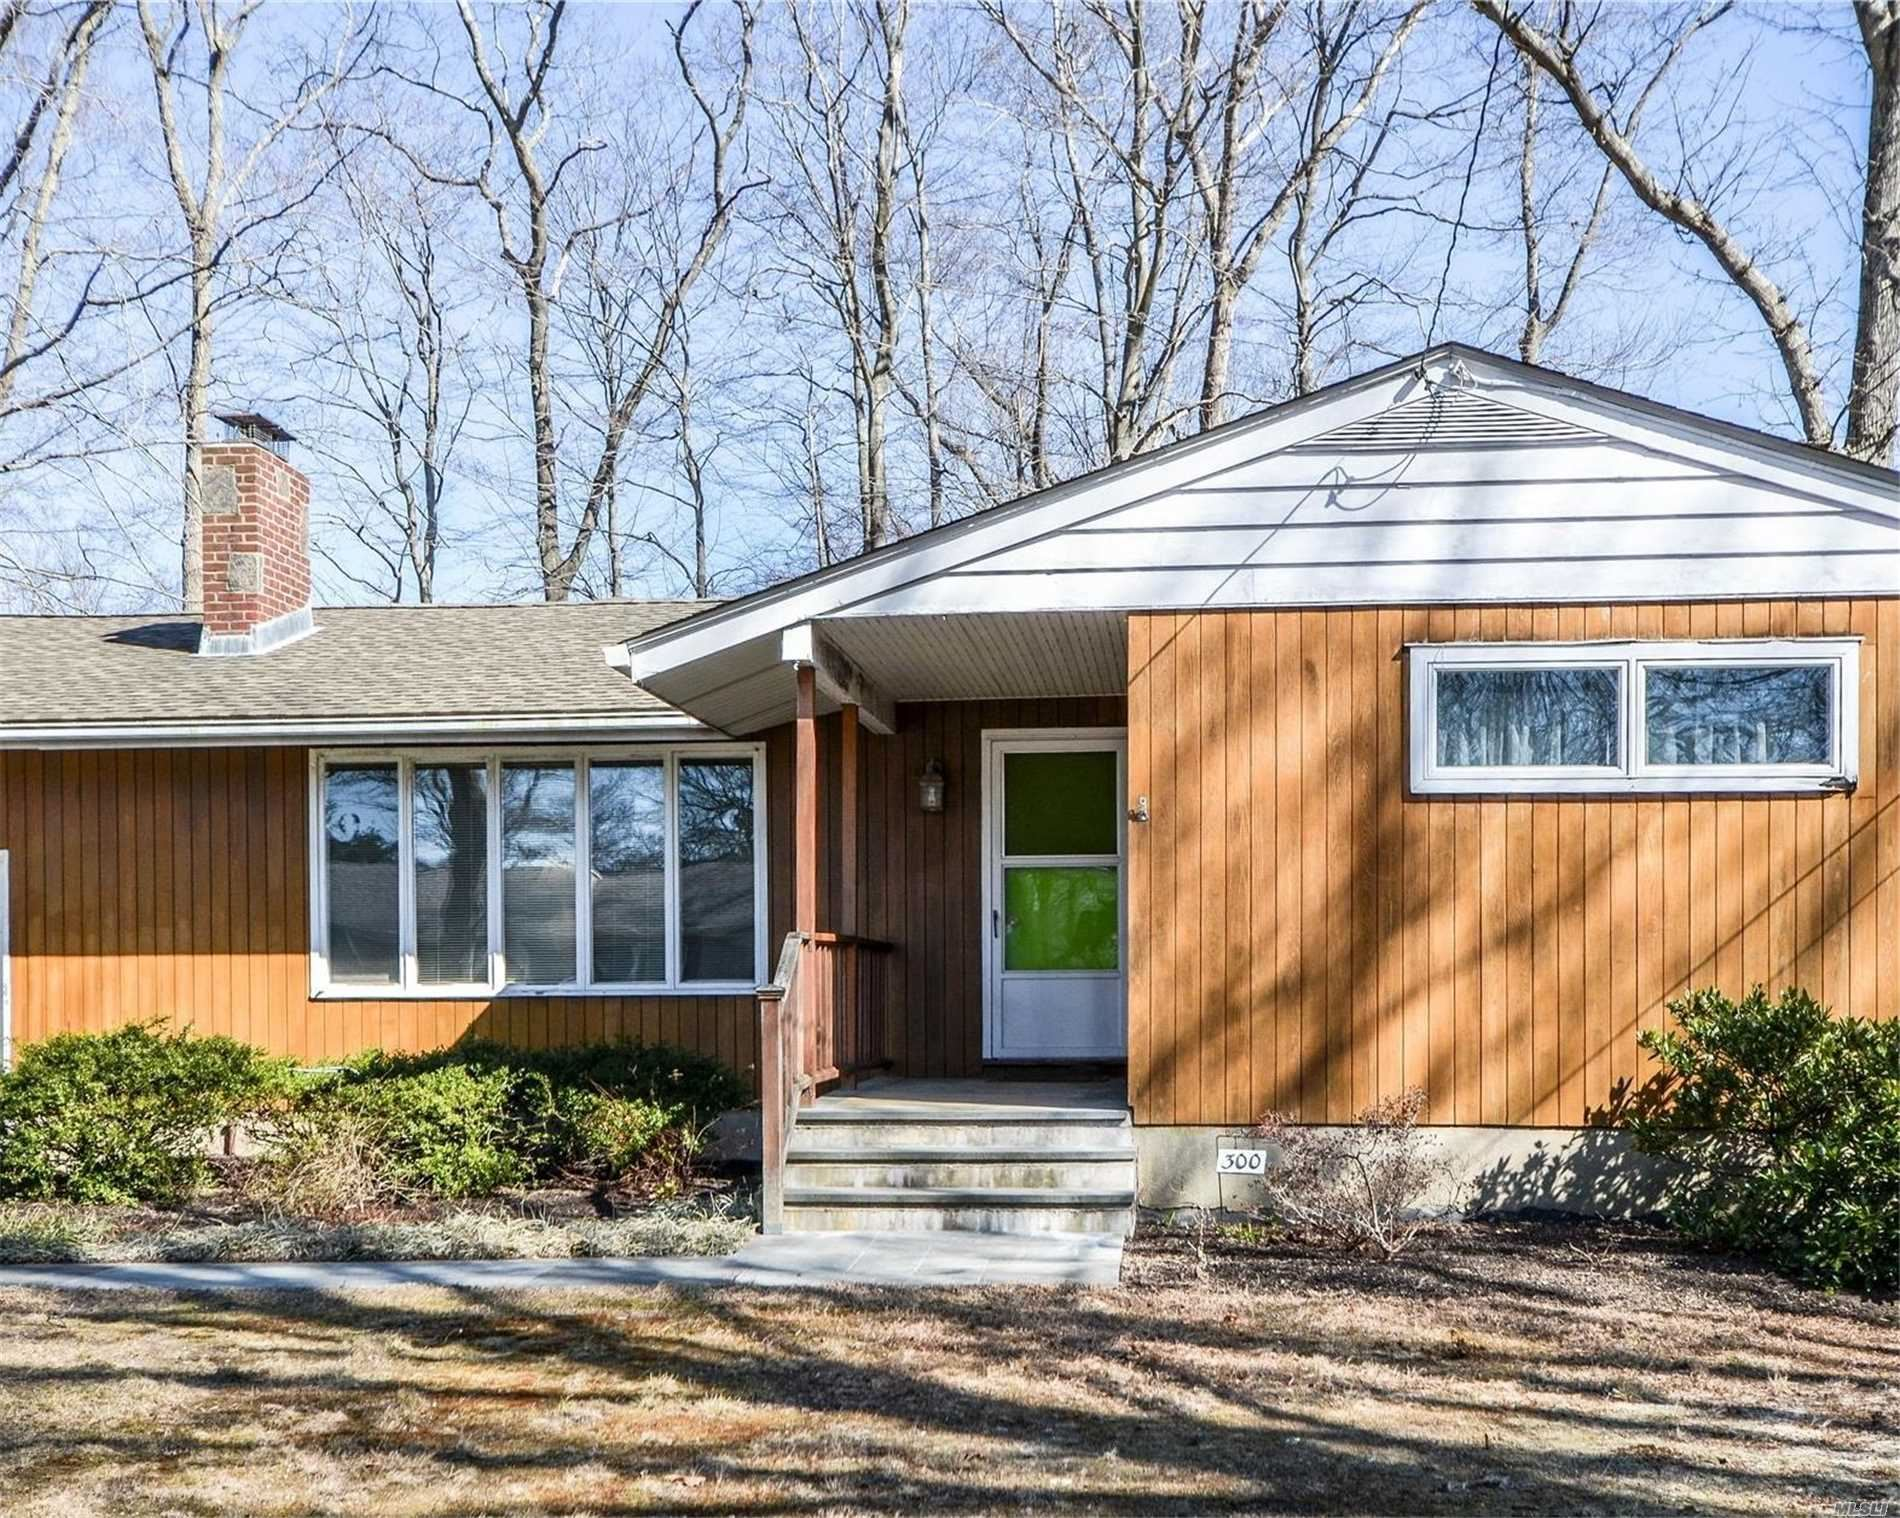 300 Woodcliff Drive, Mattituck, NY 11952 - MLS#: 3204259